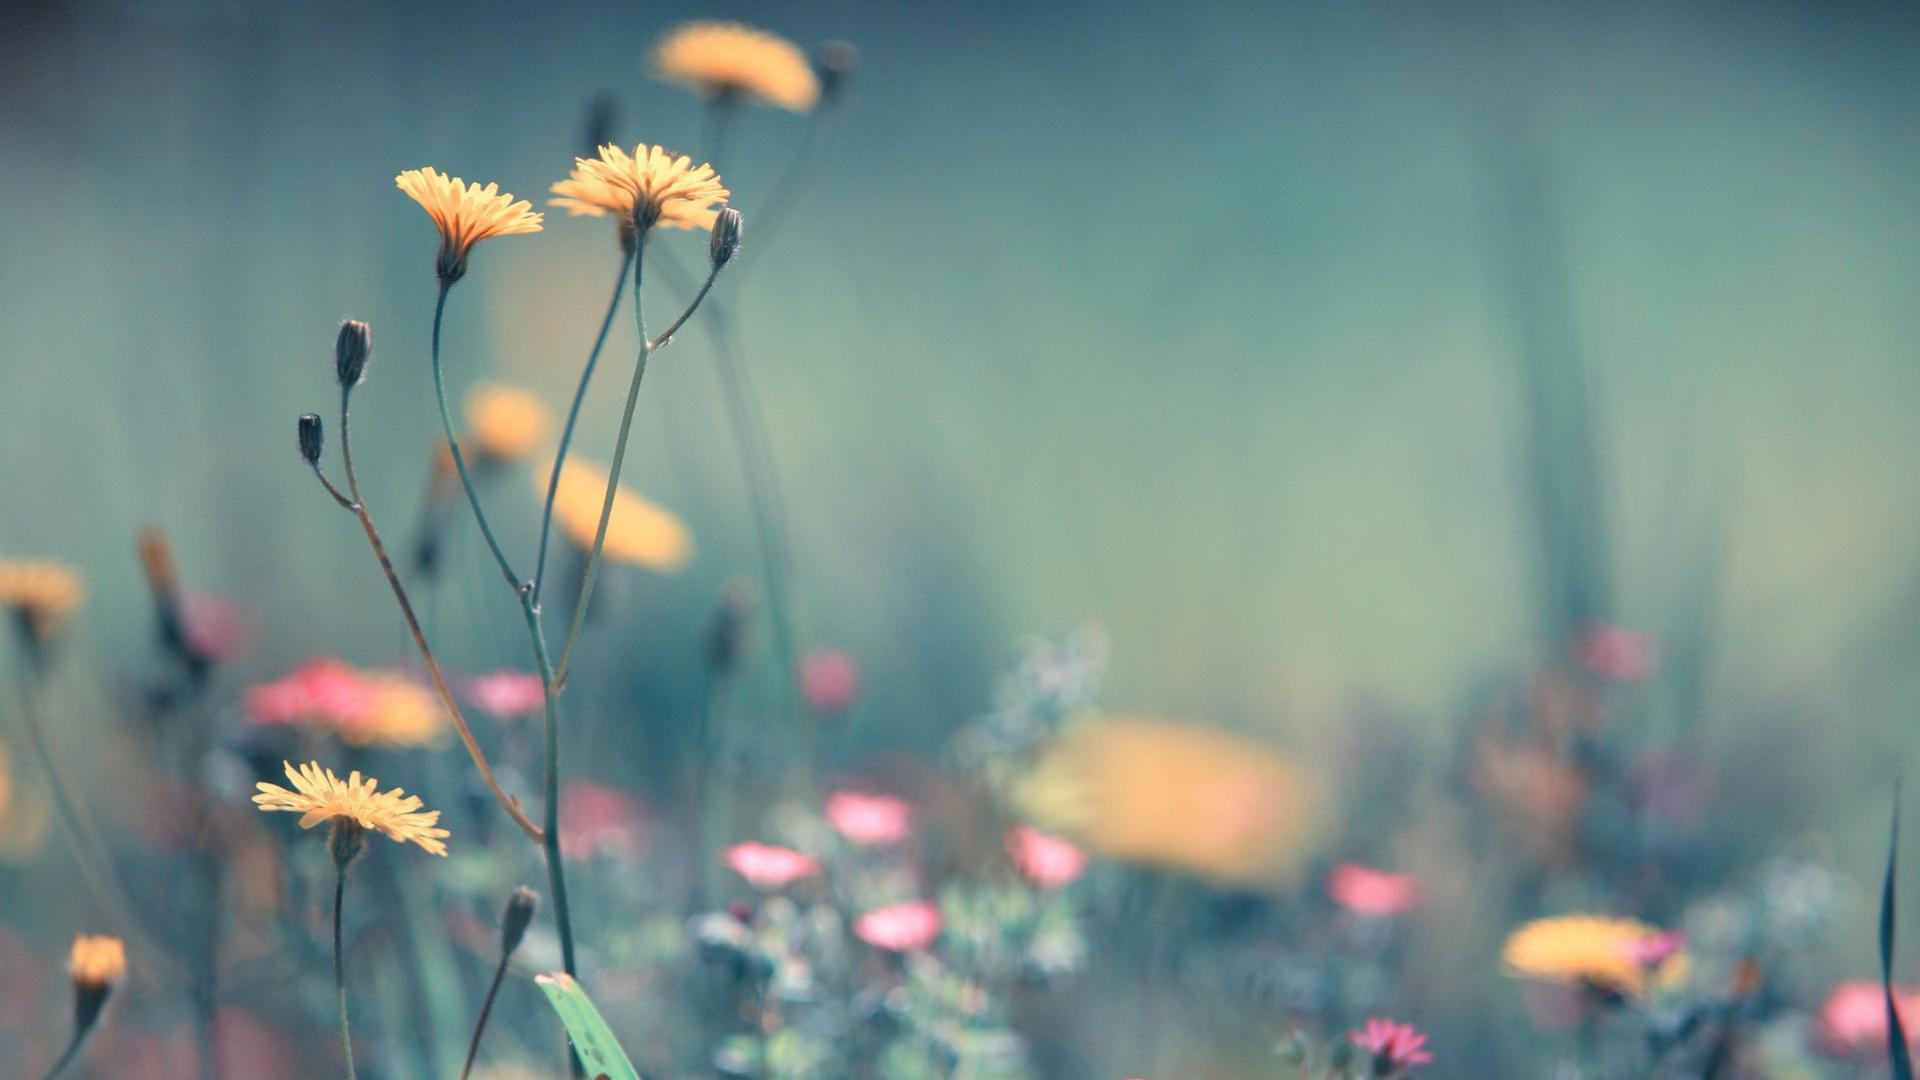 pink full hd wallpaper Flower spiring wallpaper download 1080p 1920x1080